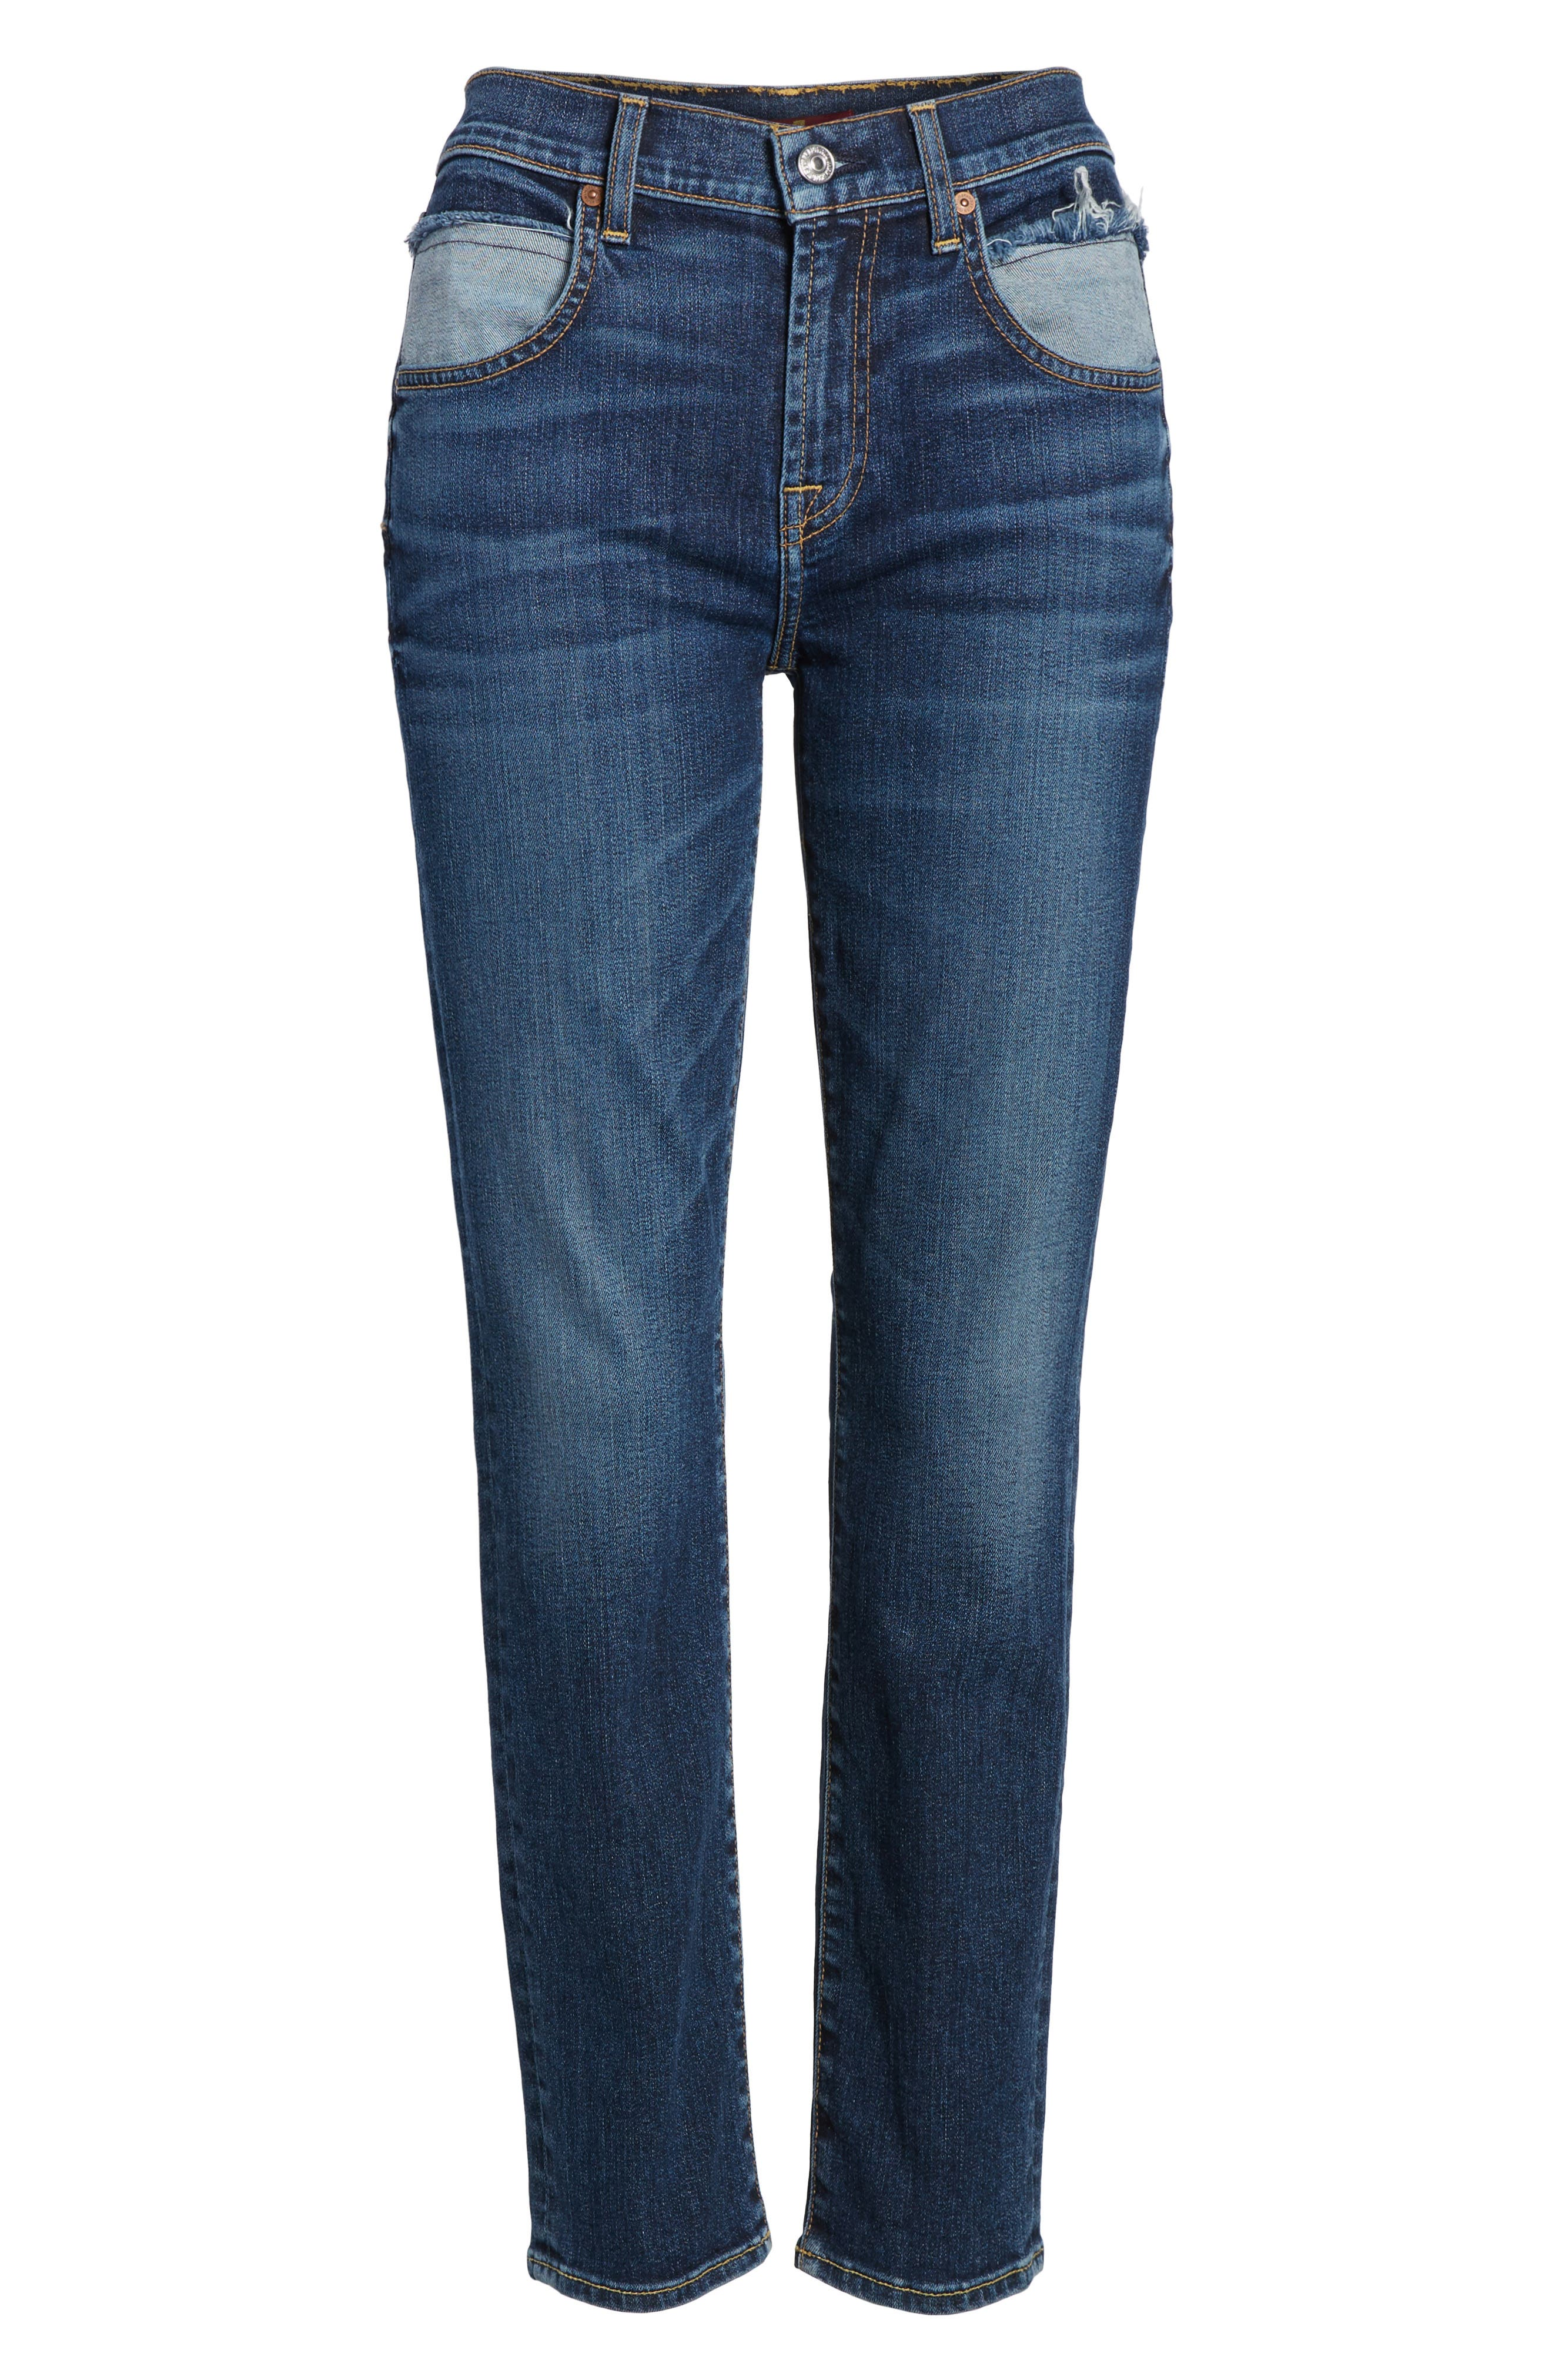 Roxanne Pieced Pocket Ankle Skinny Jeans,                             Alternate thumbnail 7, color,                             Midnight Desert